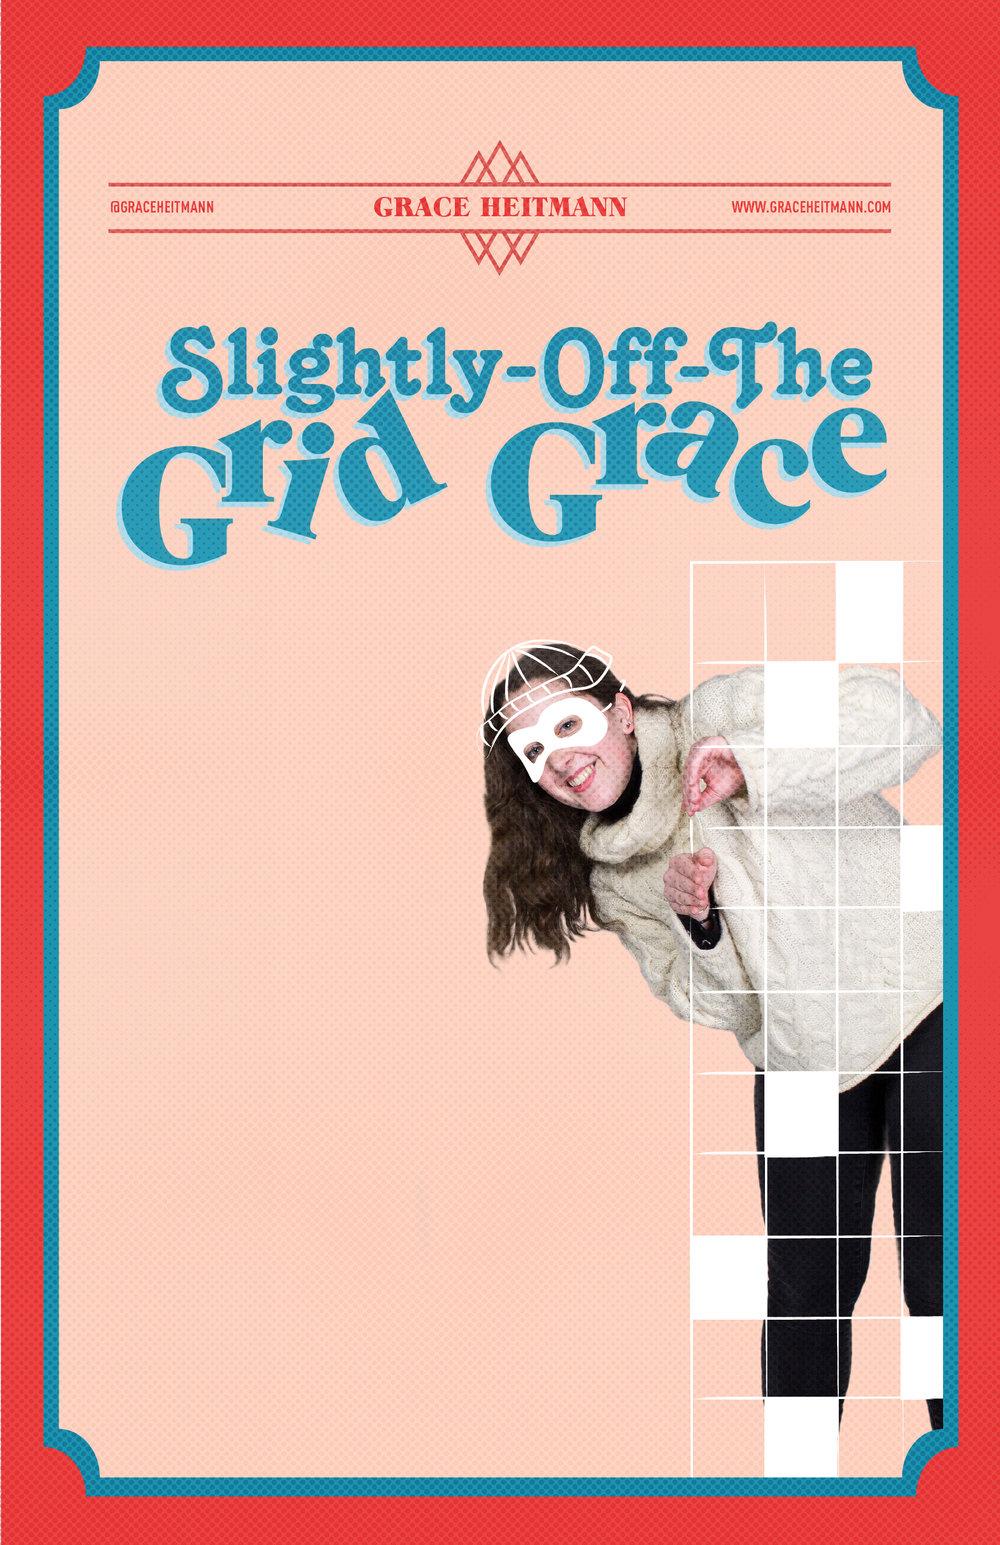 Grace-18.jpg